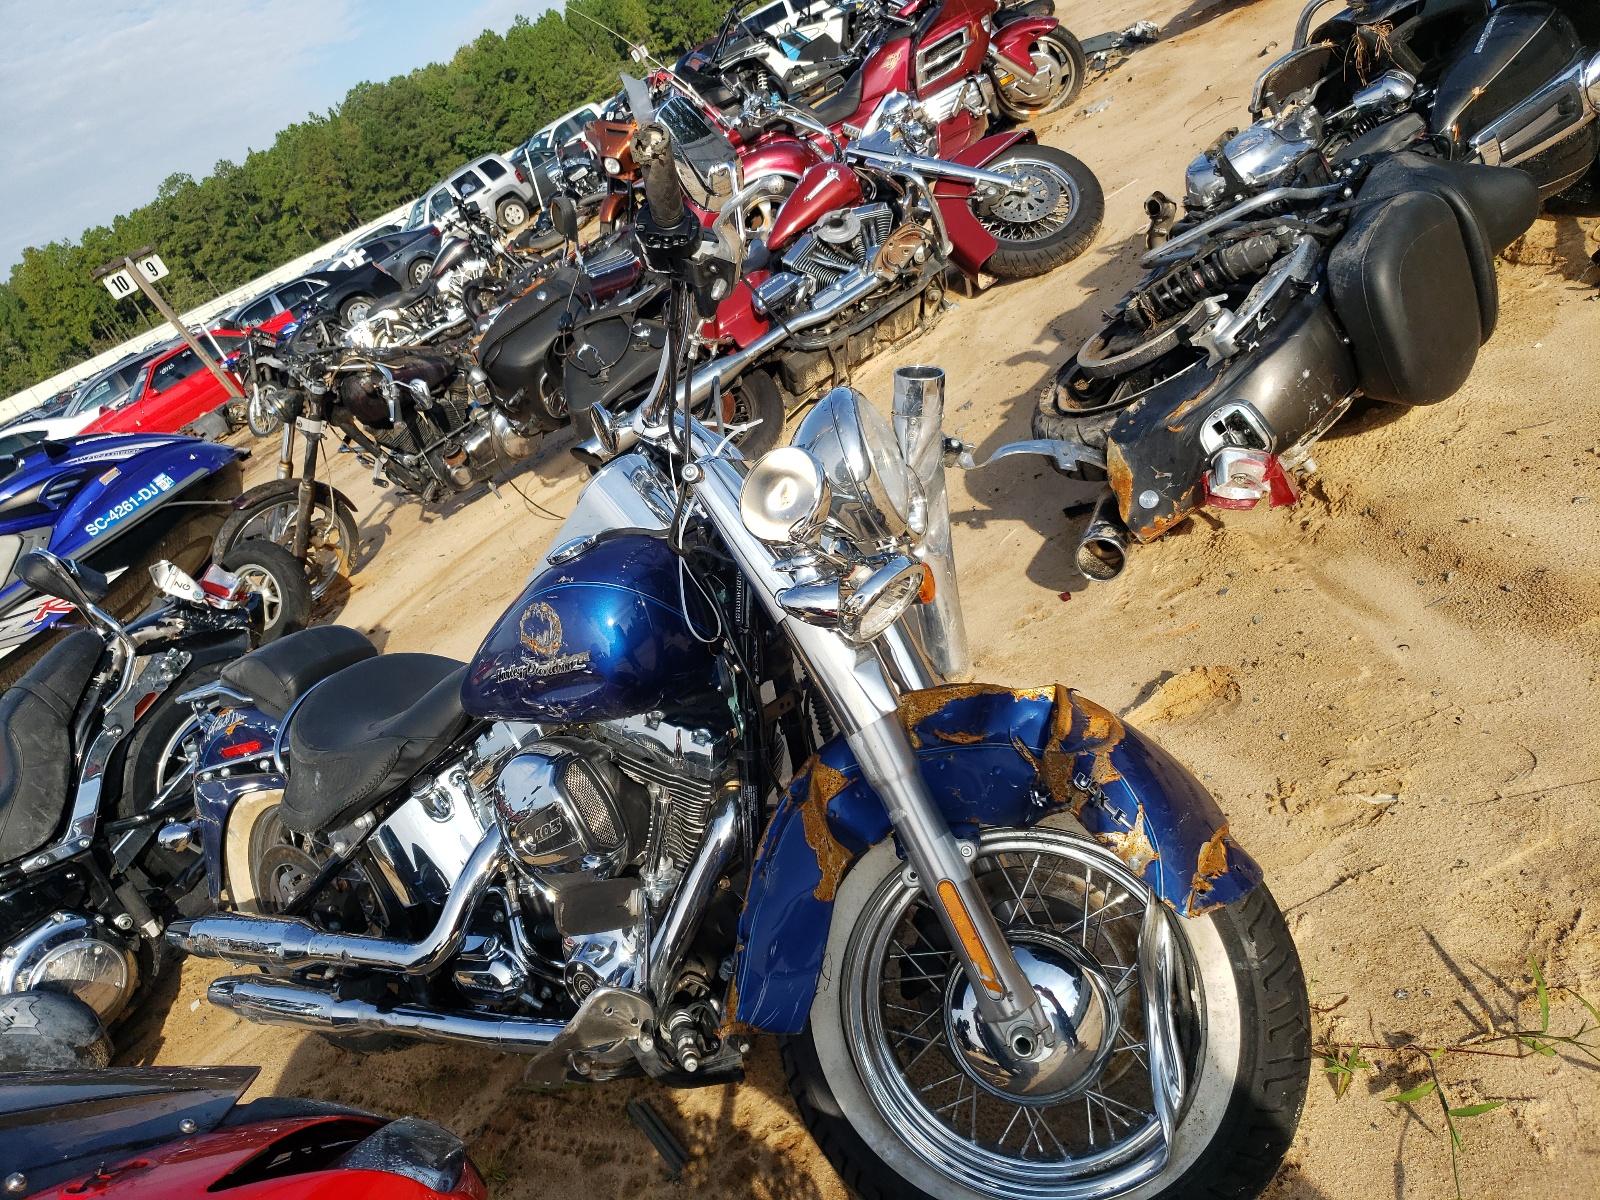 2017 Harley-Davidson Flstn Soft